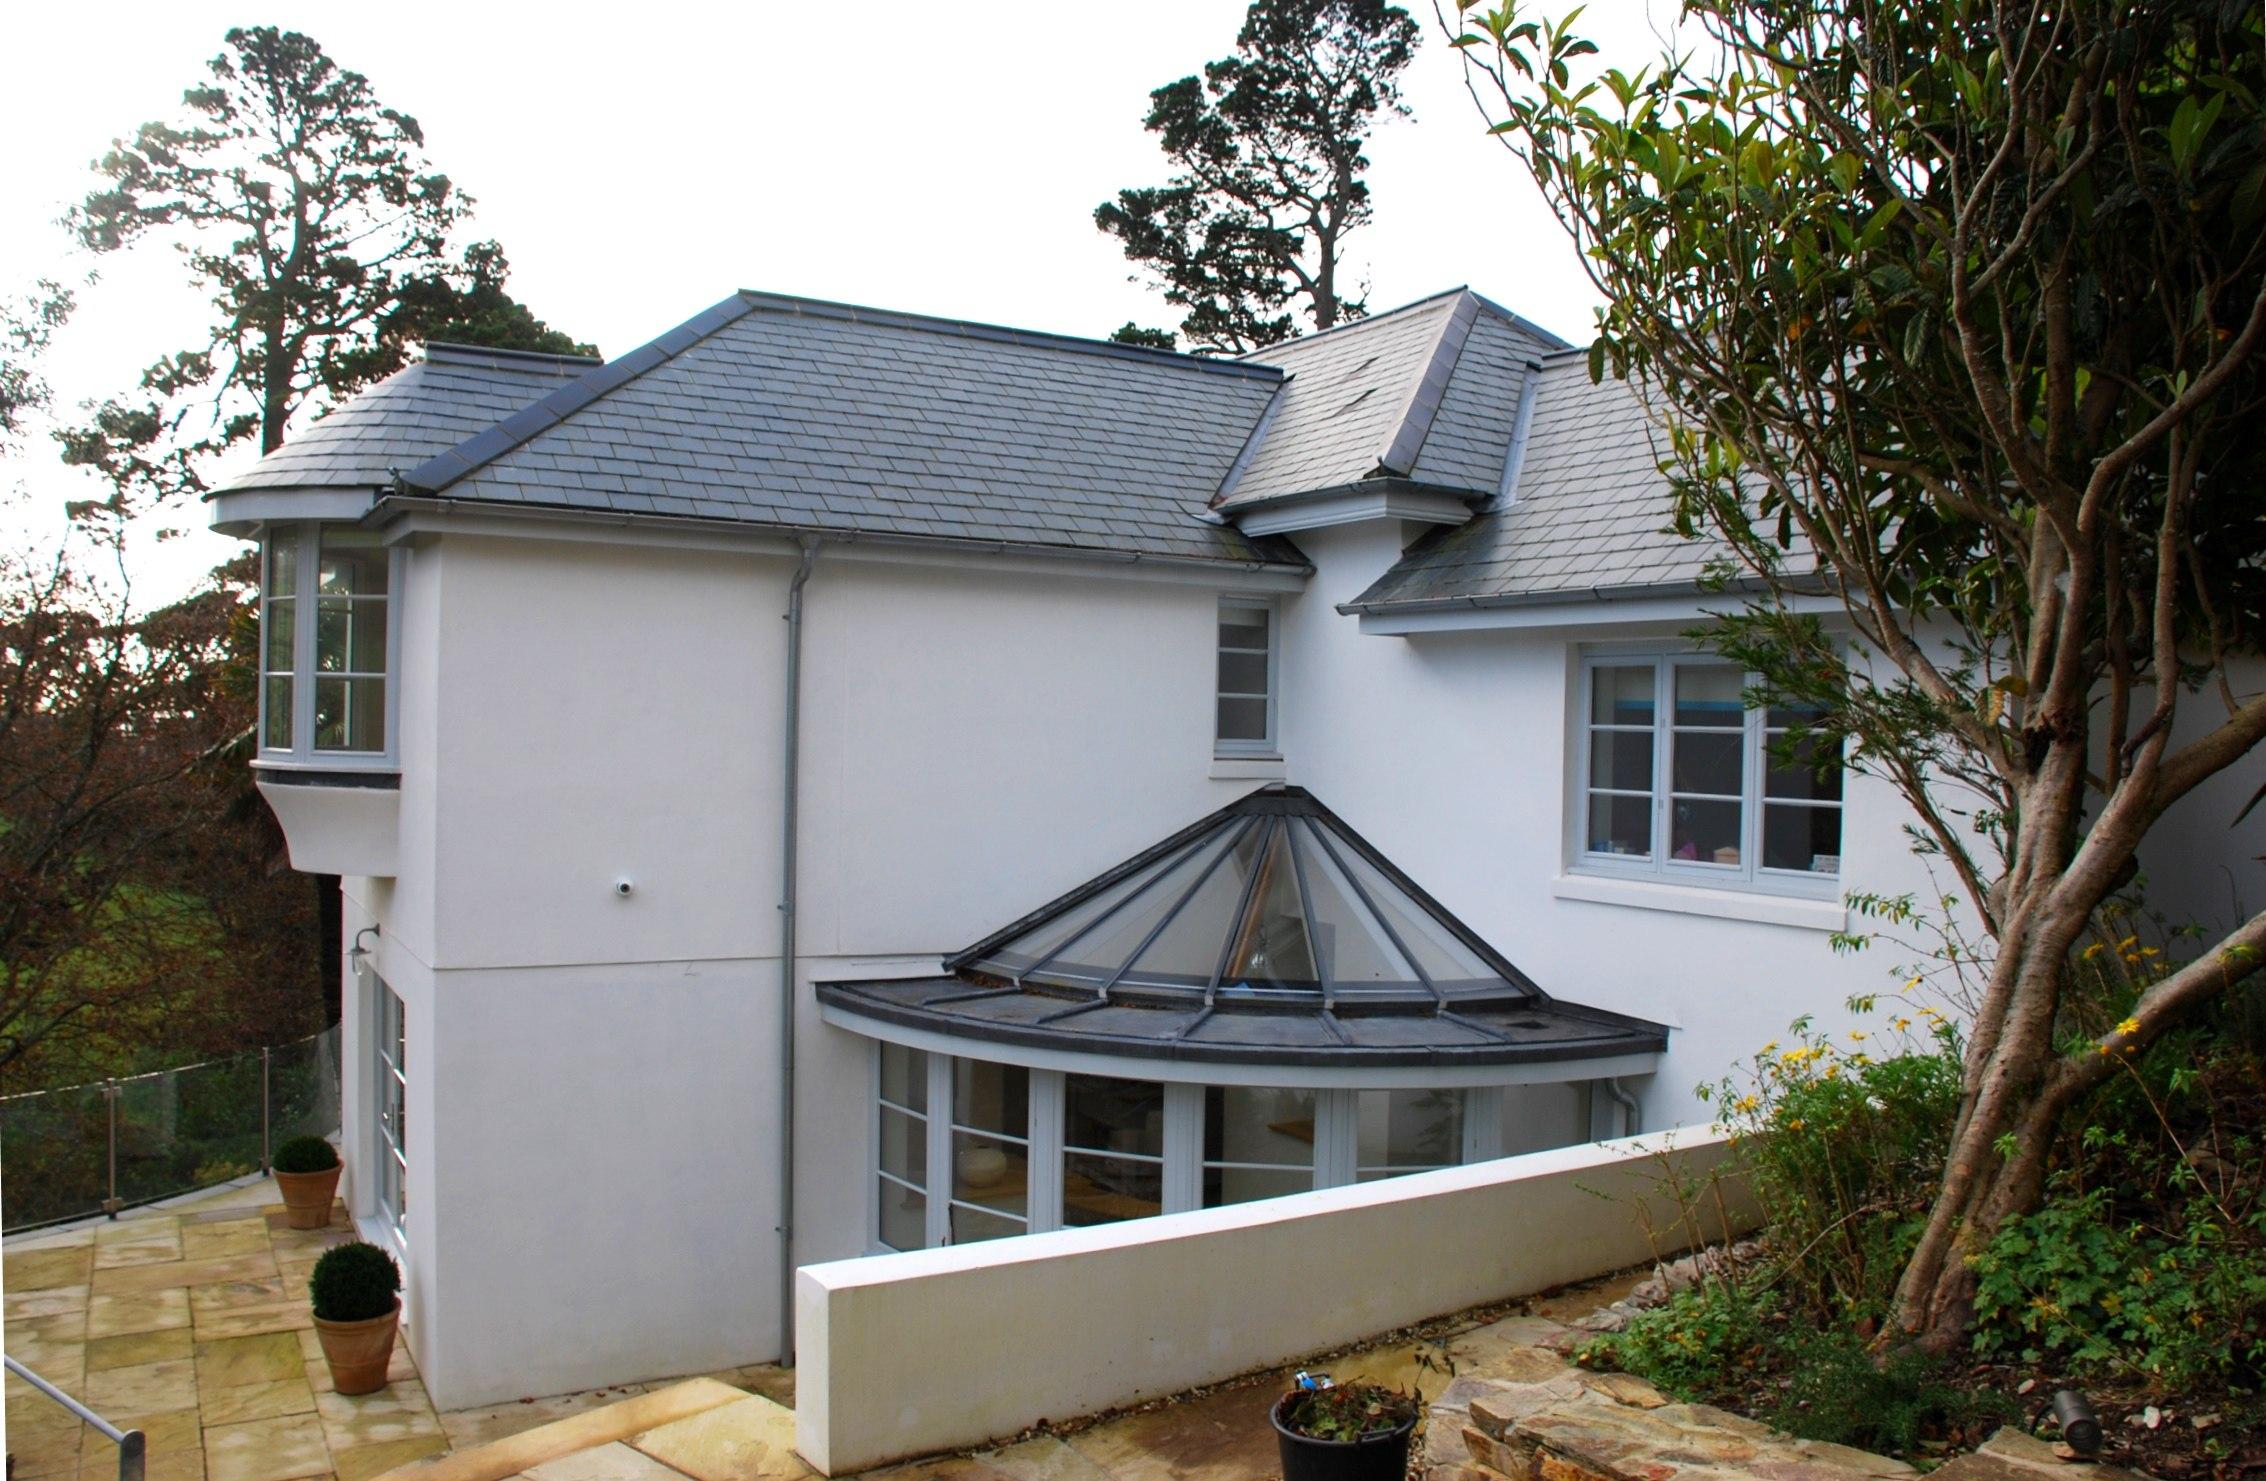 Victorian property exterior design